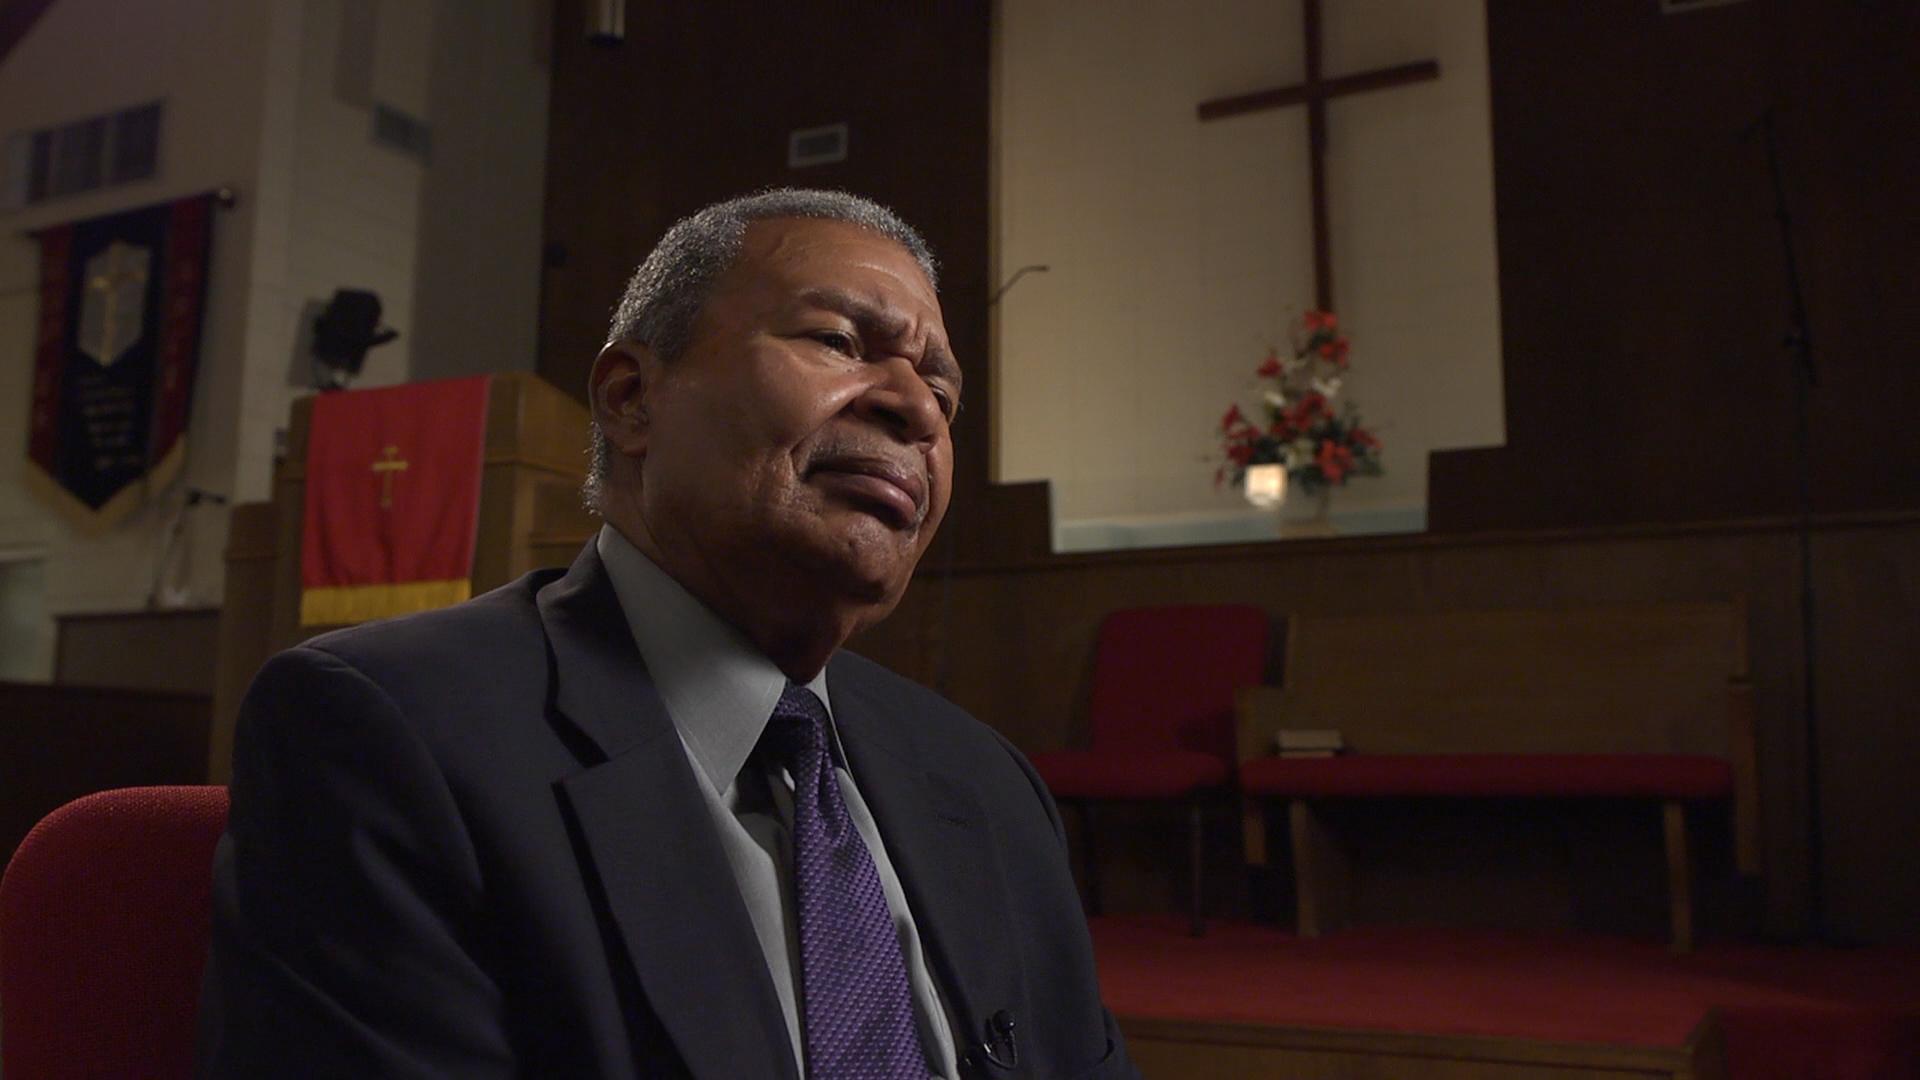 Wendell Paris – Realizing the Dream Award from University of Alabama